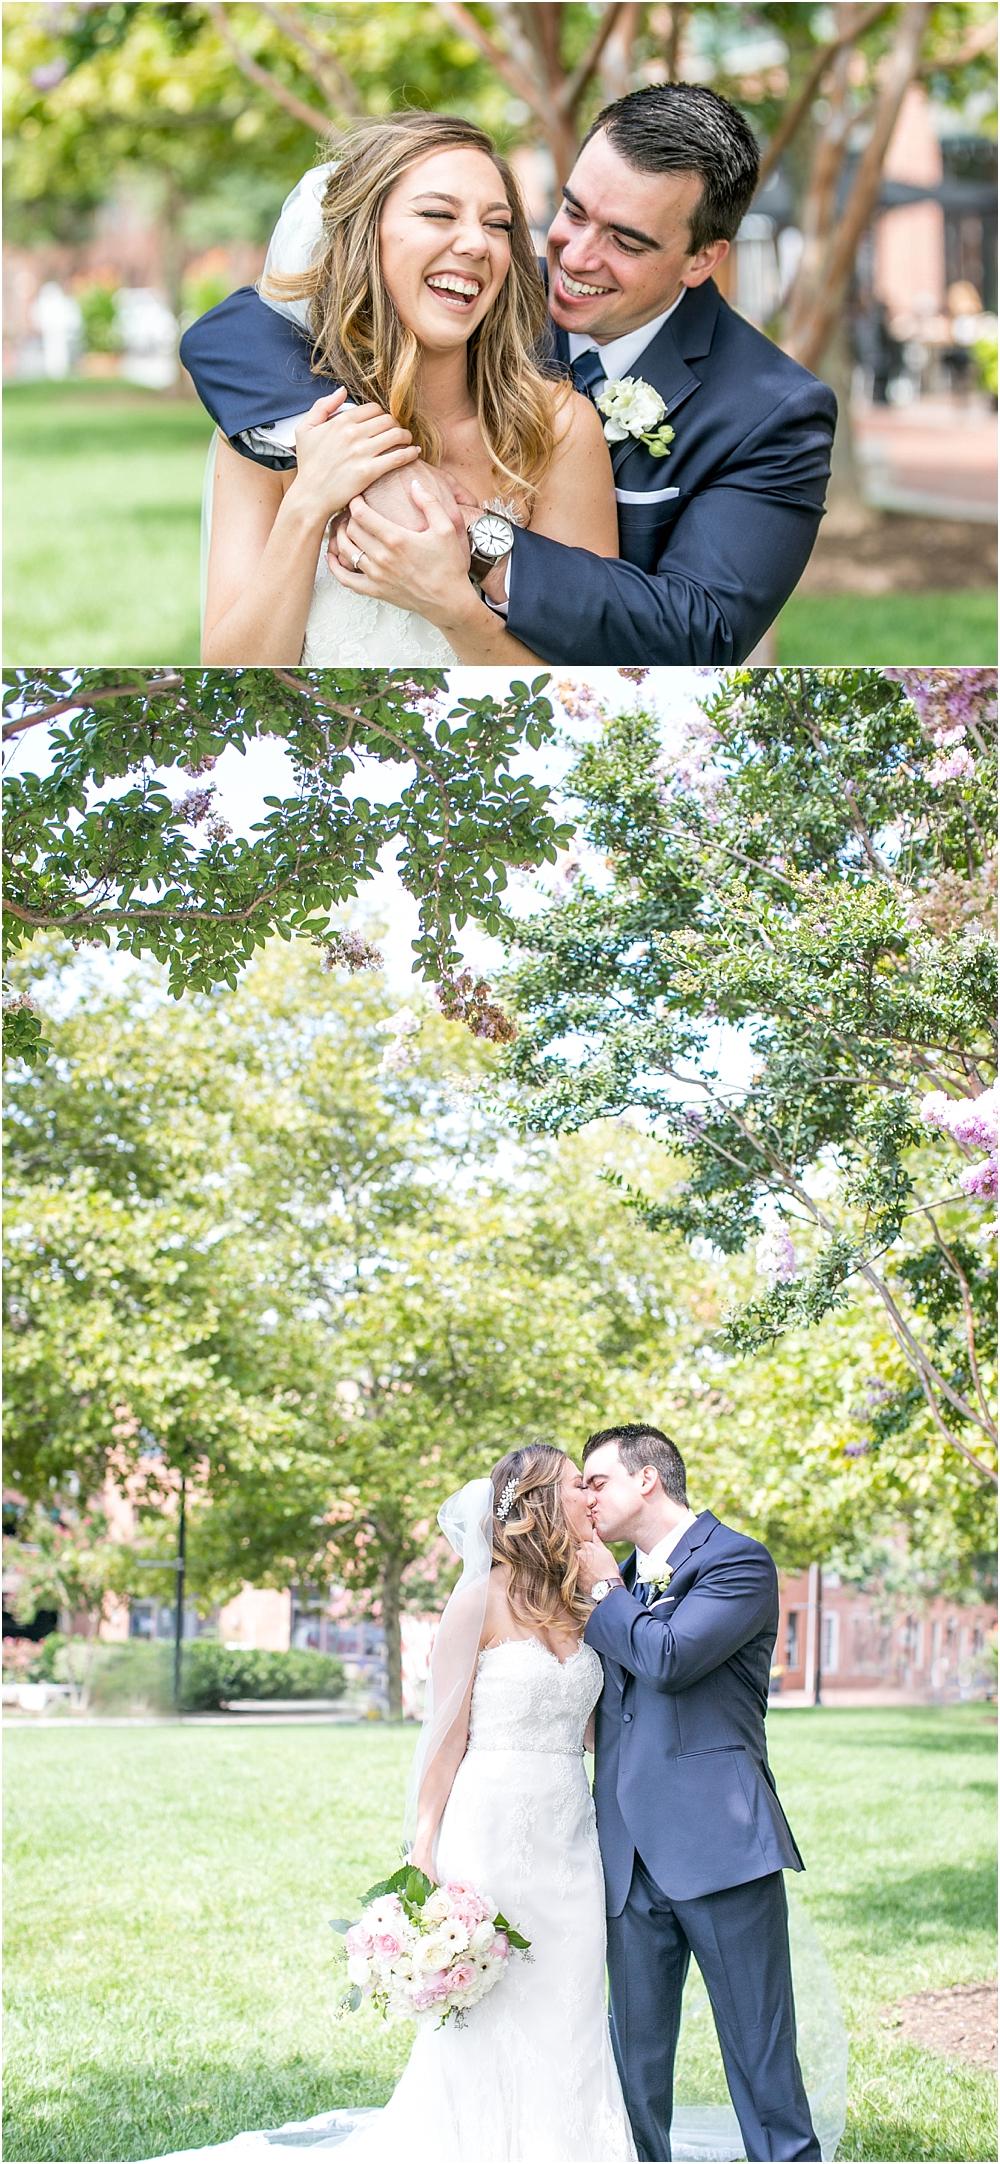 L B McCulloch Mt. Washington Mill Dye House Wedding Living Radiant Photography_0020.jpg